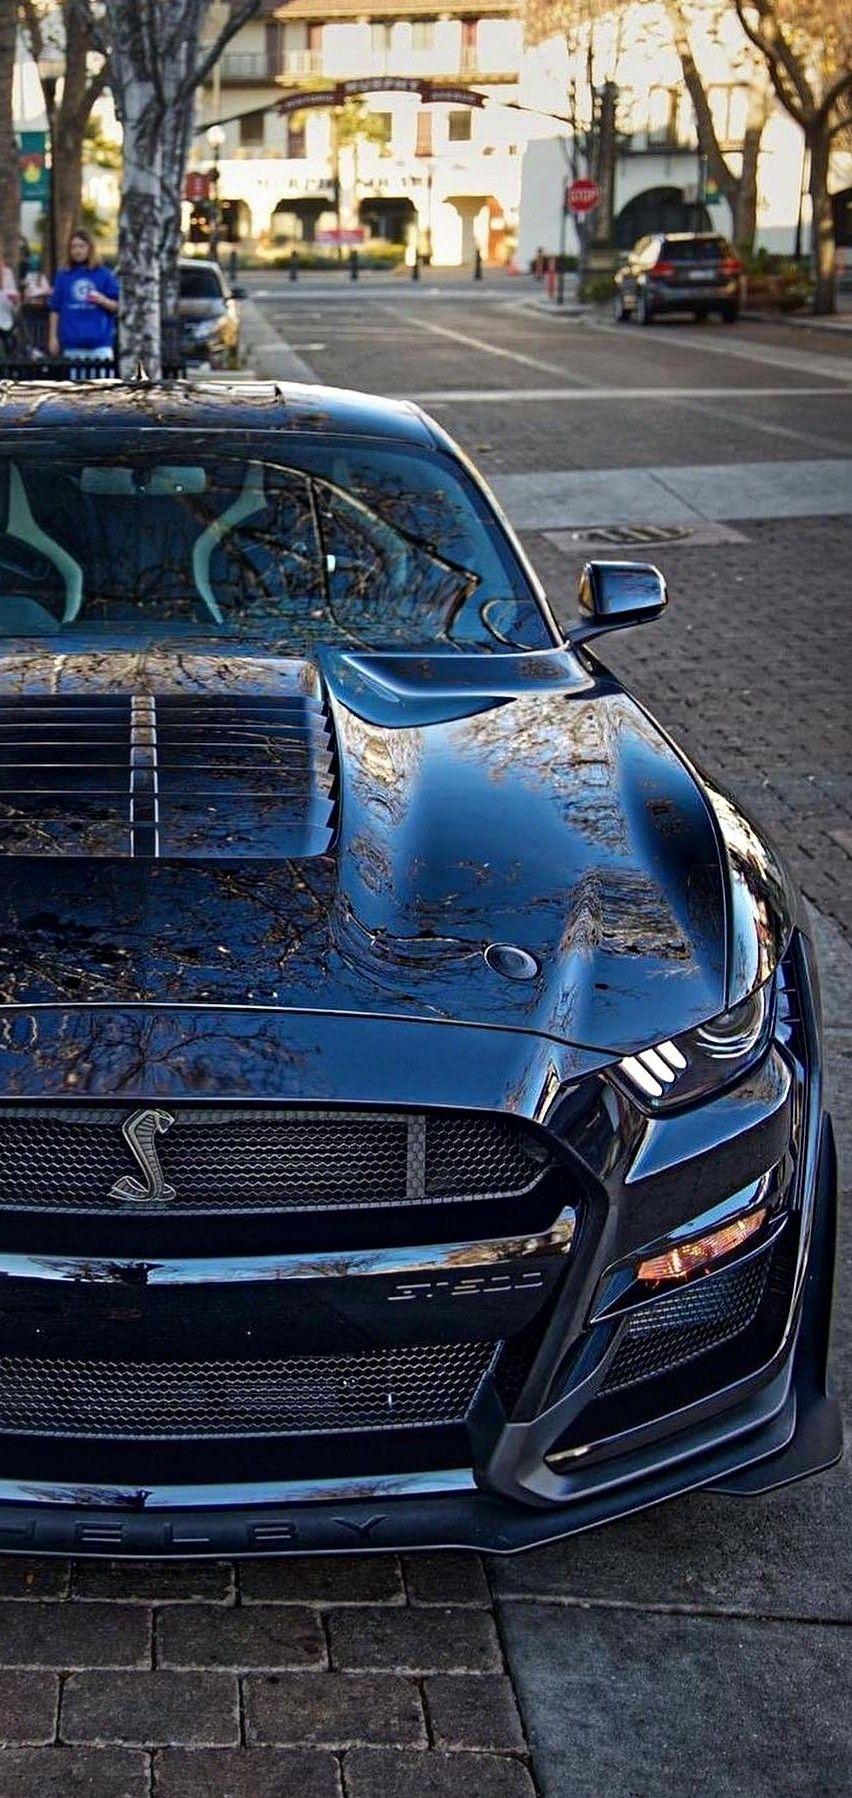 Wallpaper Ford Mustang Wapplaper Ford Mustang Mustang Carros Wallpaper Carros Em 2021 Lamborguini Nissan Gt R Veiculos